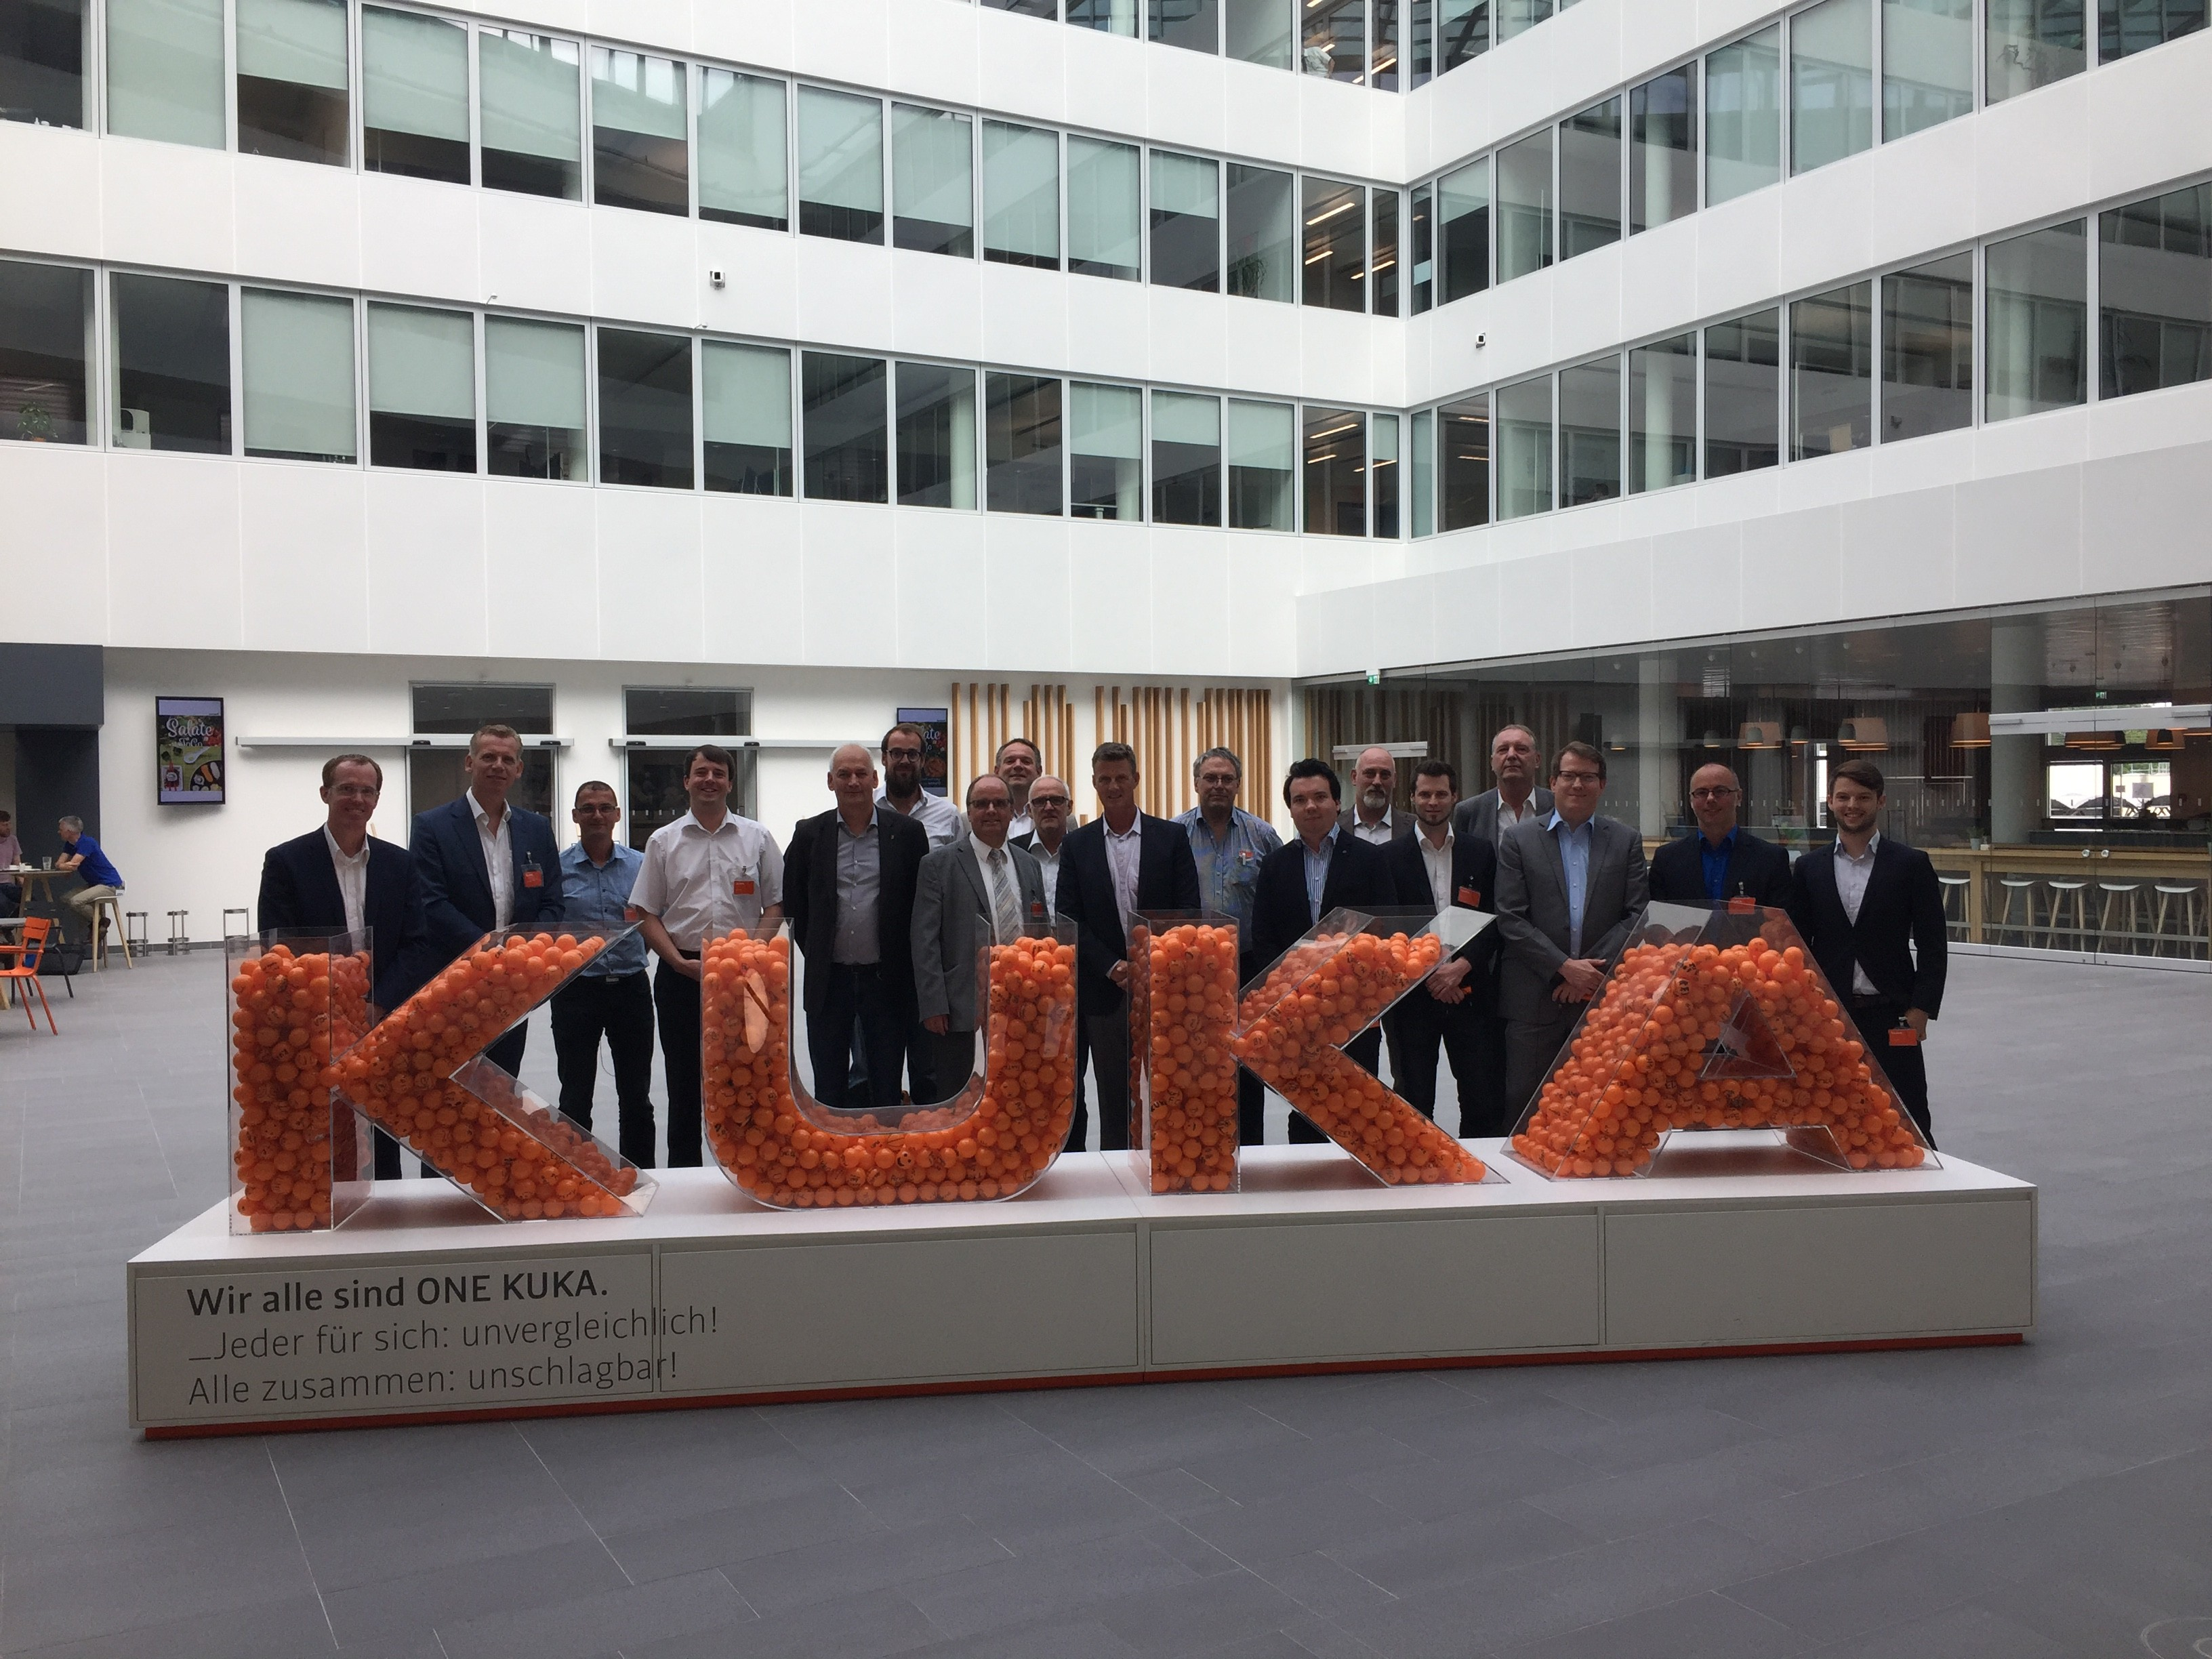 FSK-Fachgruppensitzung bei KUKA in Augsburg